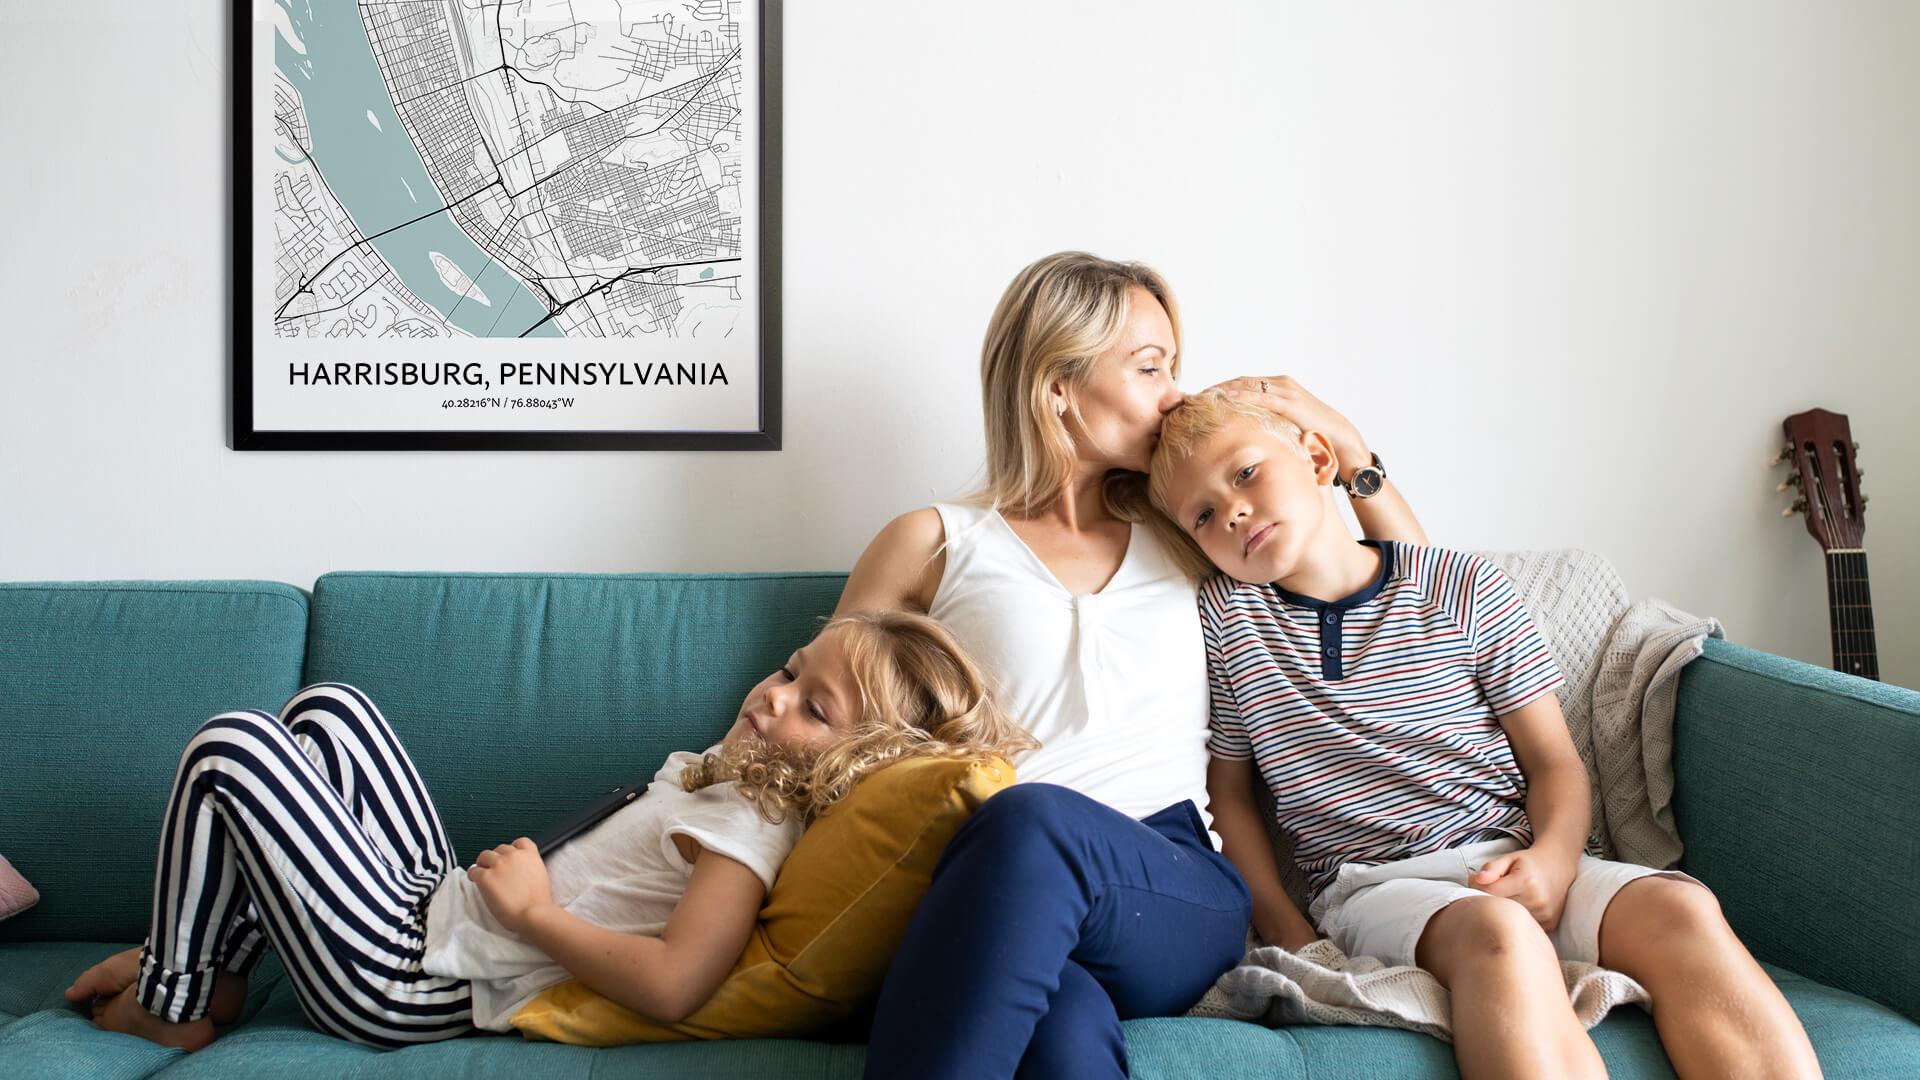 Harrisburg map poster